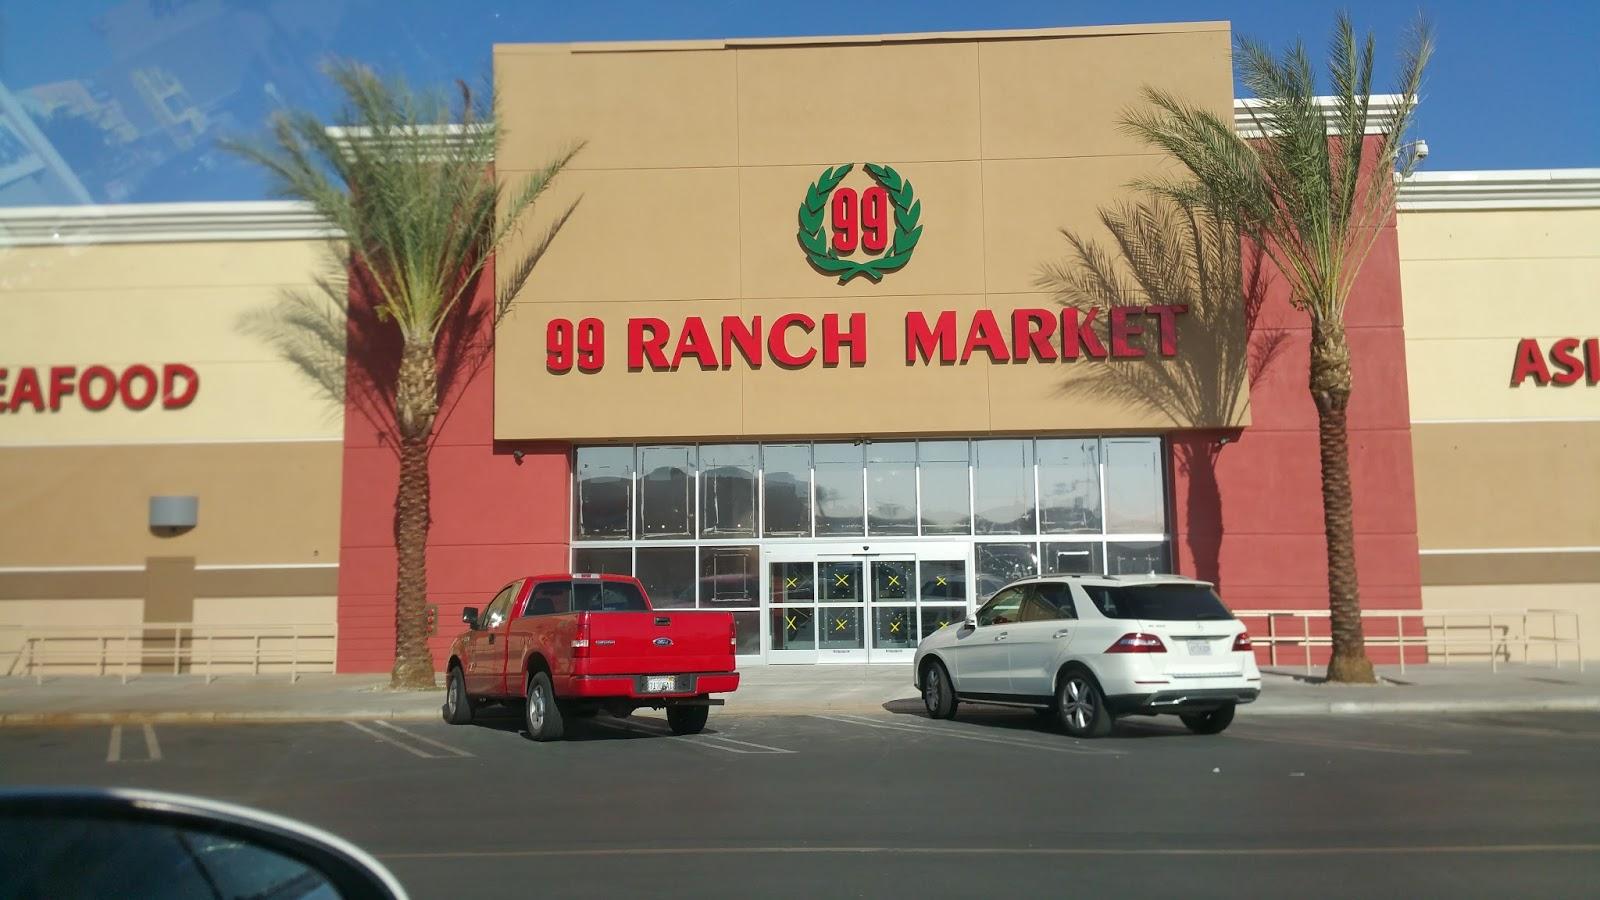 Kitchen Remodel Las Vegas Organizers 99 Ranch 大華超級市場 2 新店即將開張 我们有10个邻近的 我们有10个邻近的房屋供你选择 7万 16万美元 他们很可能在未来5年内价格翻倍 所以打电话给你 1拉斯维加